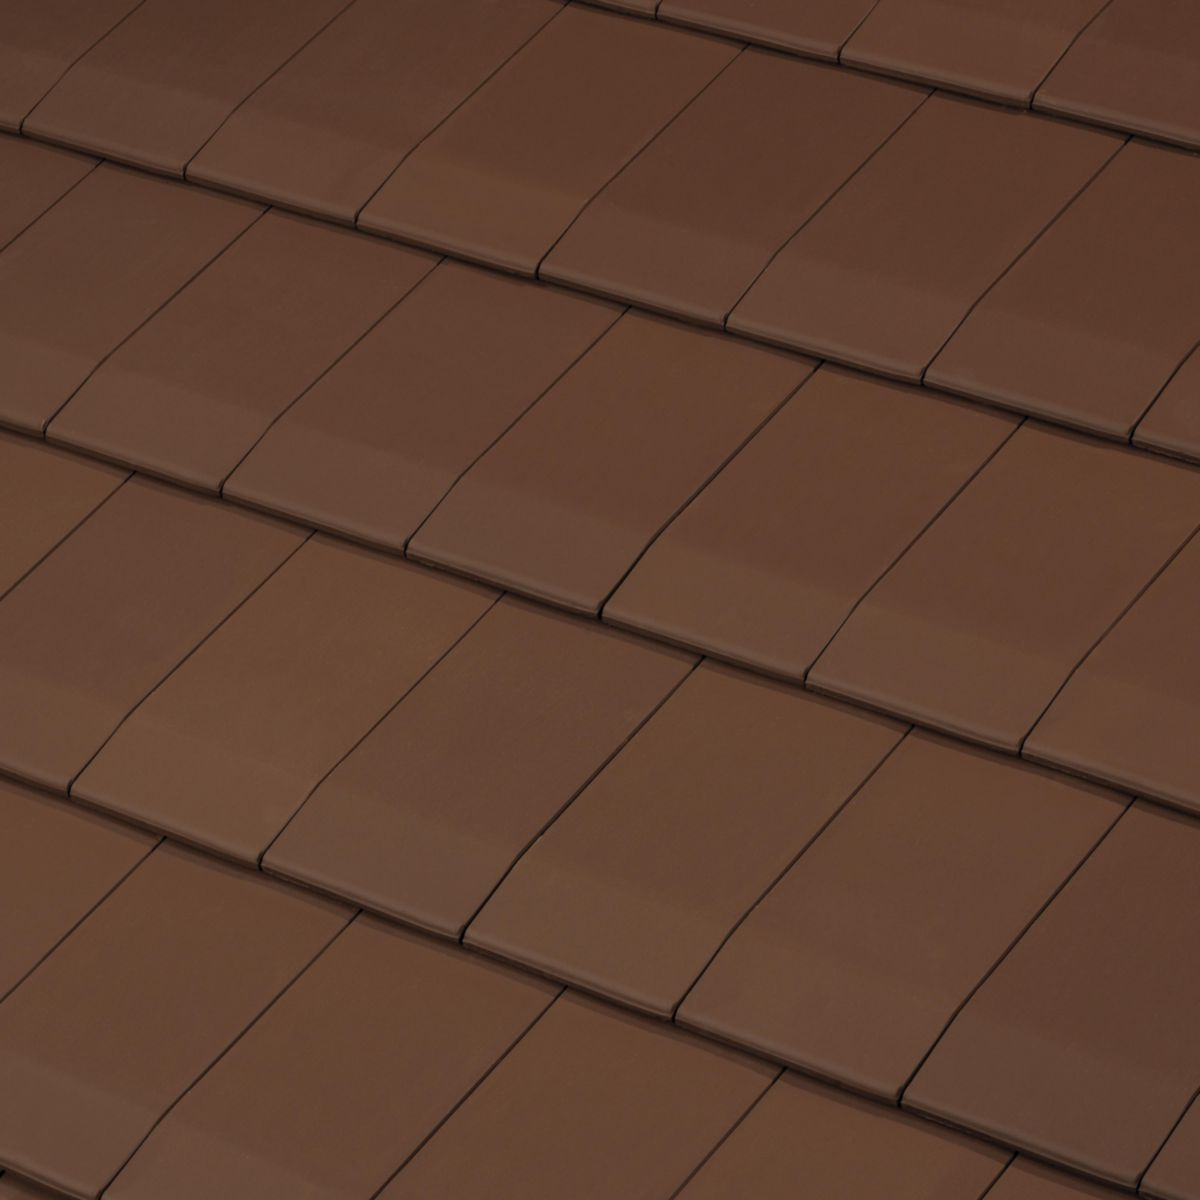 Terreal fa ti re demi ronde 34 xlm terre cuite brun - Prix tuile plate terre cuite ...